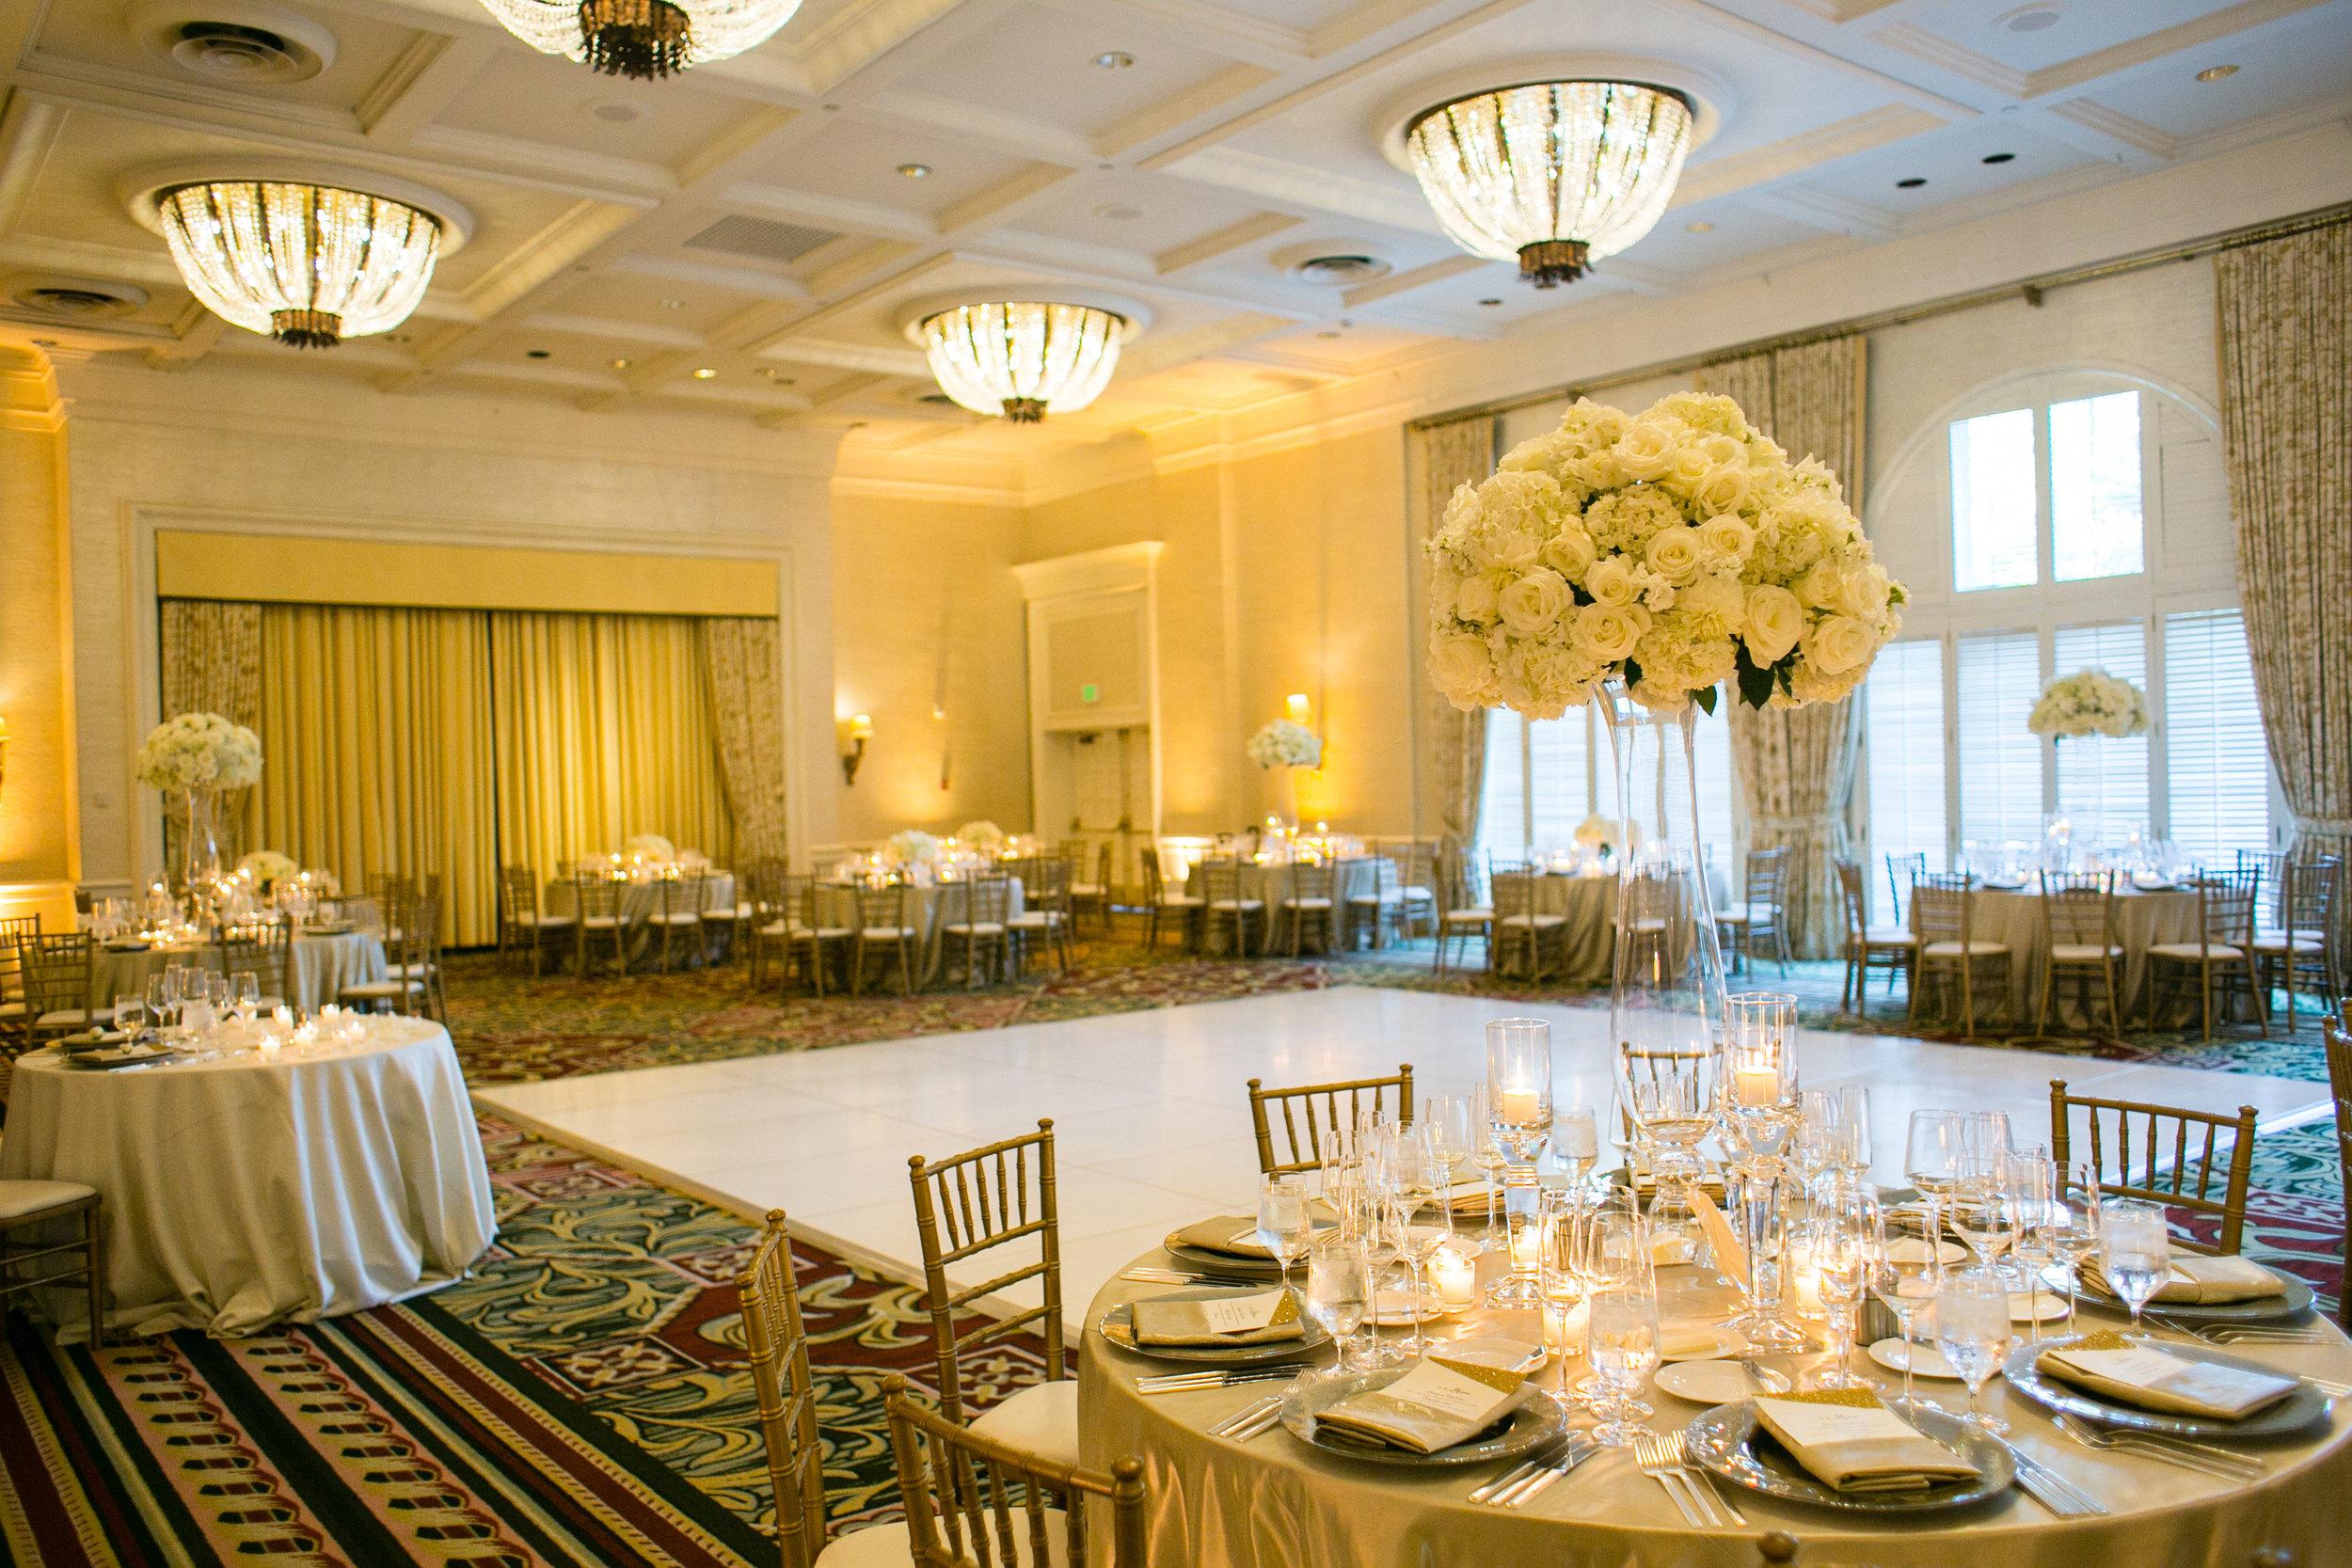 DeLa+Puenta+Phillips+Wedding-Details-0100.jpg